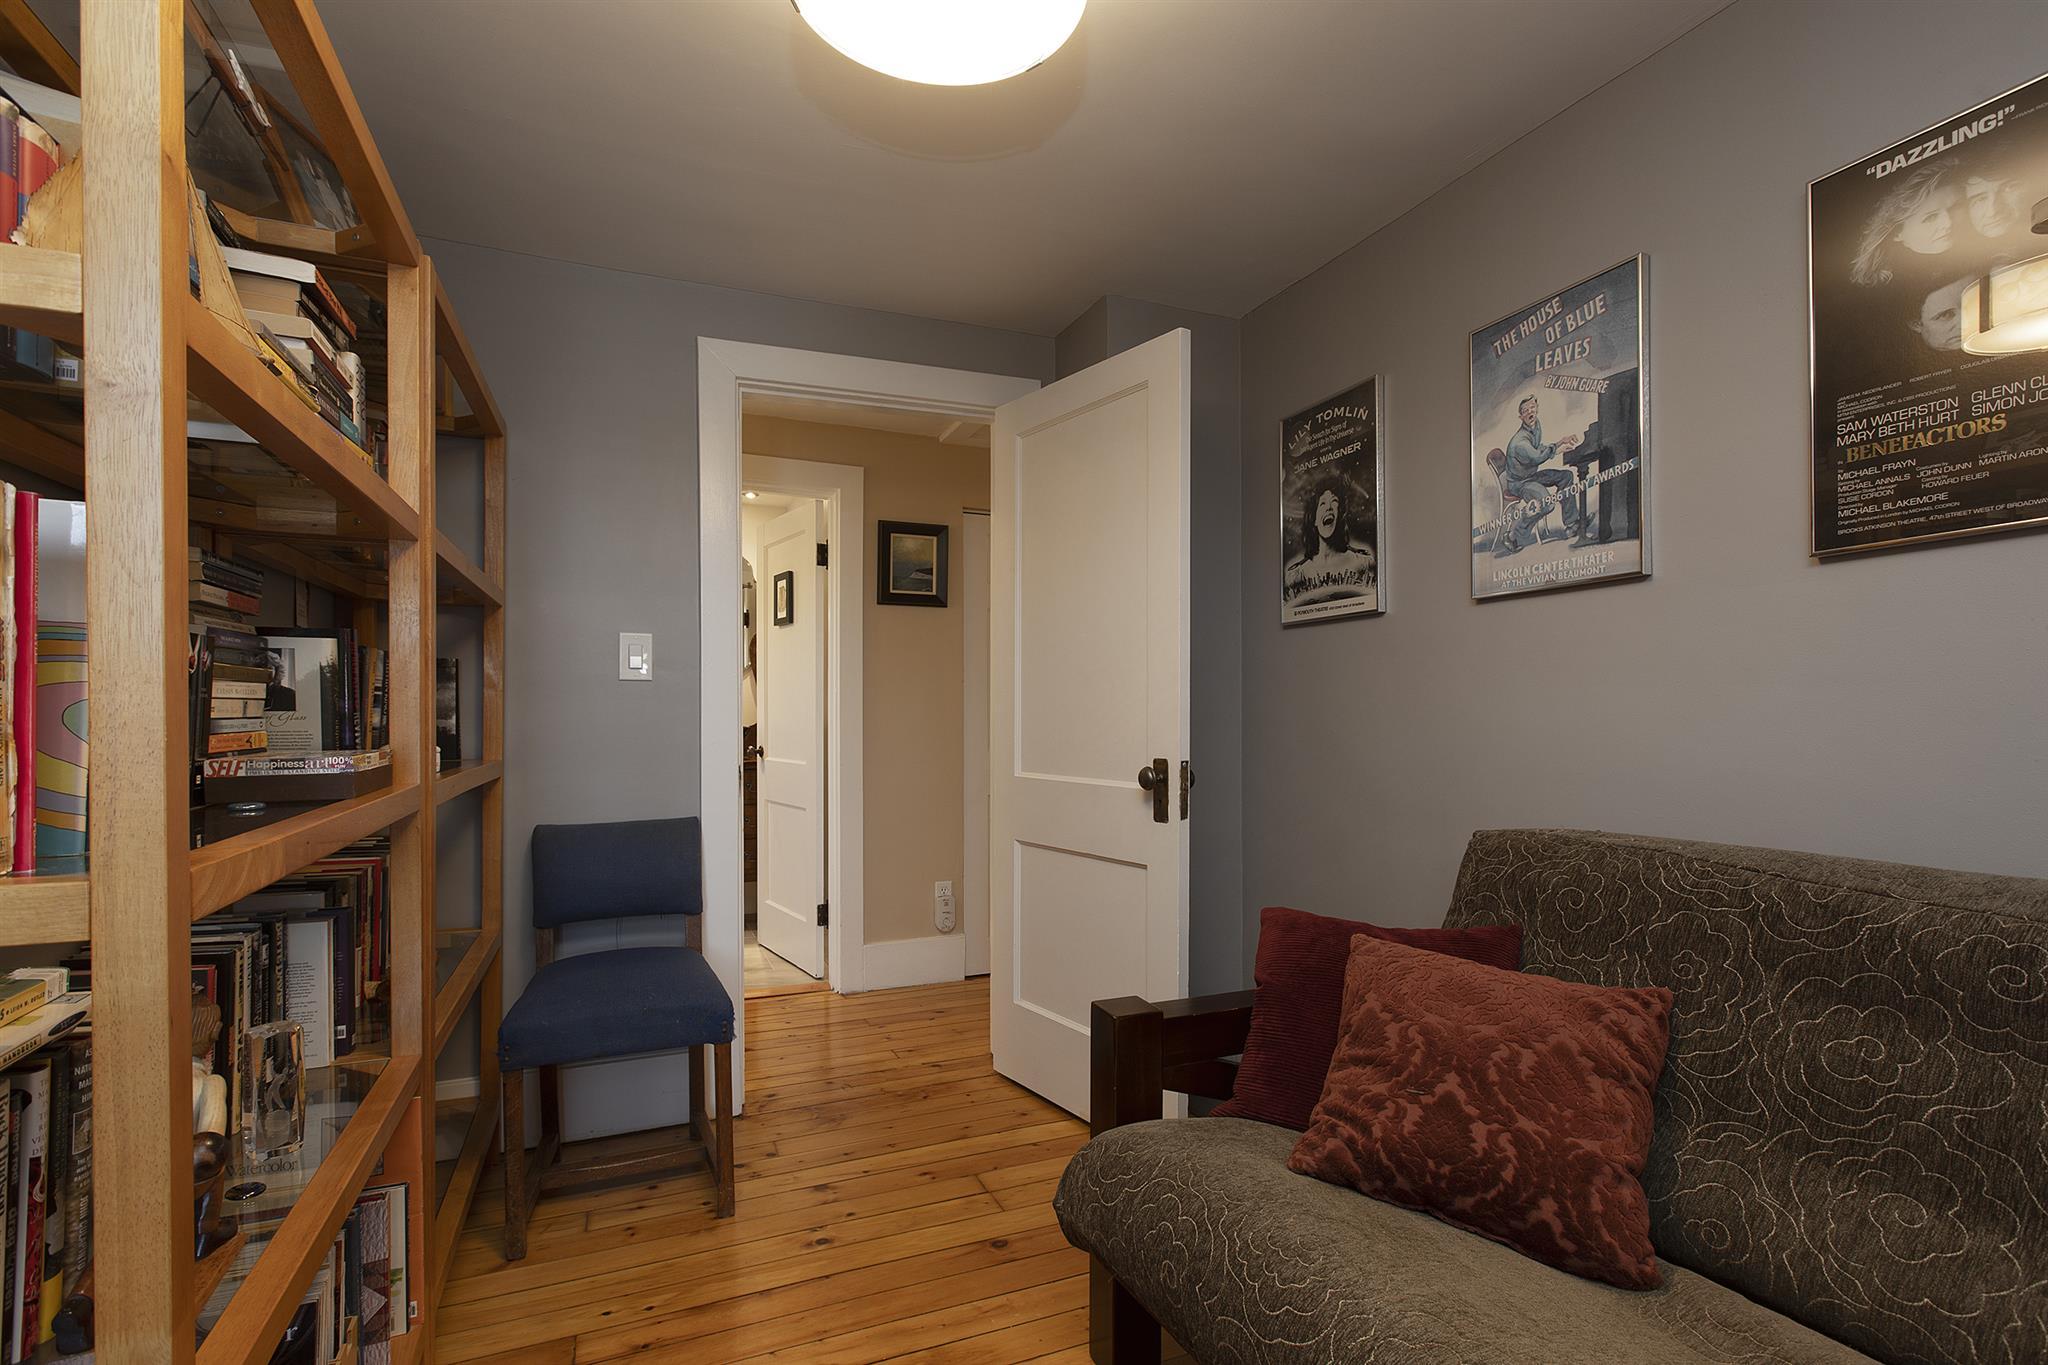 9 Drayton Avenue, Kingston, Ontario (ID K20004684)